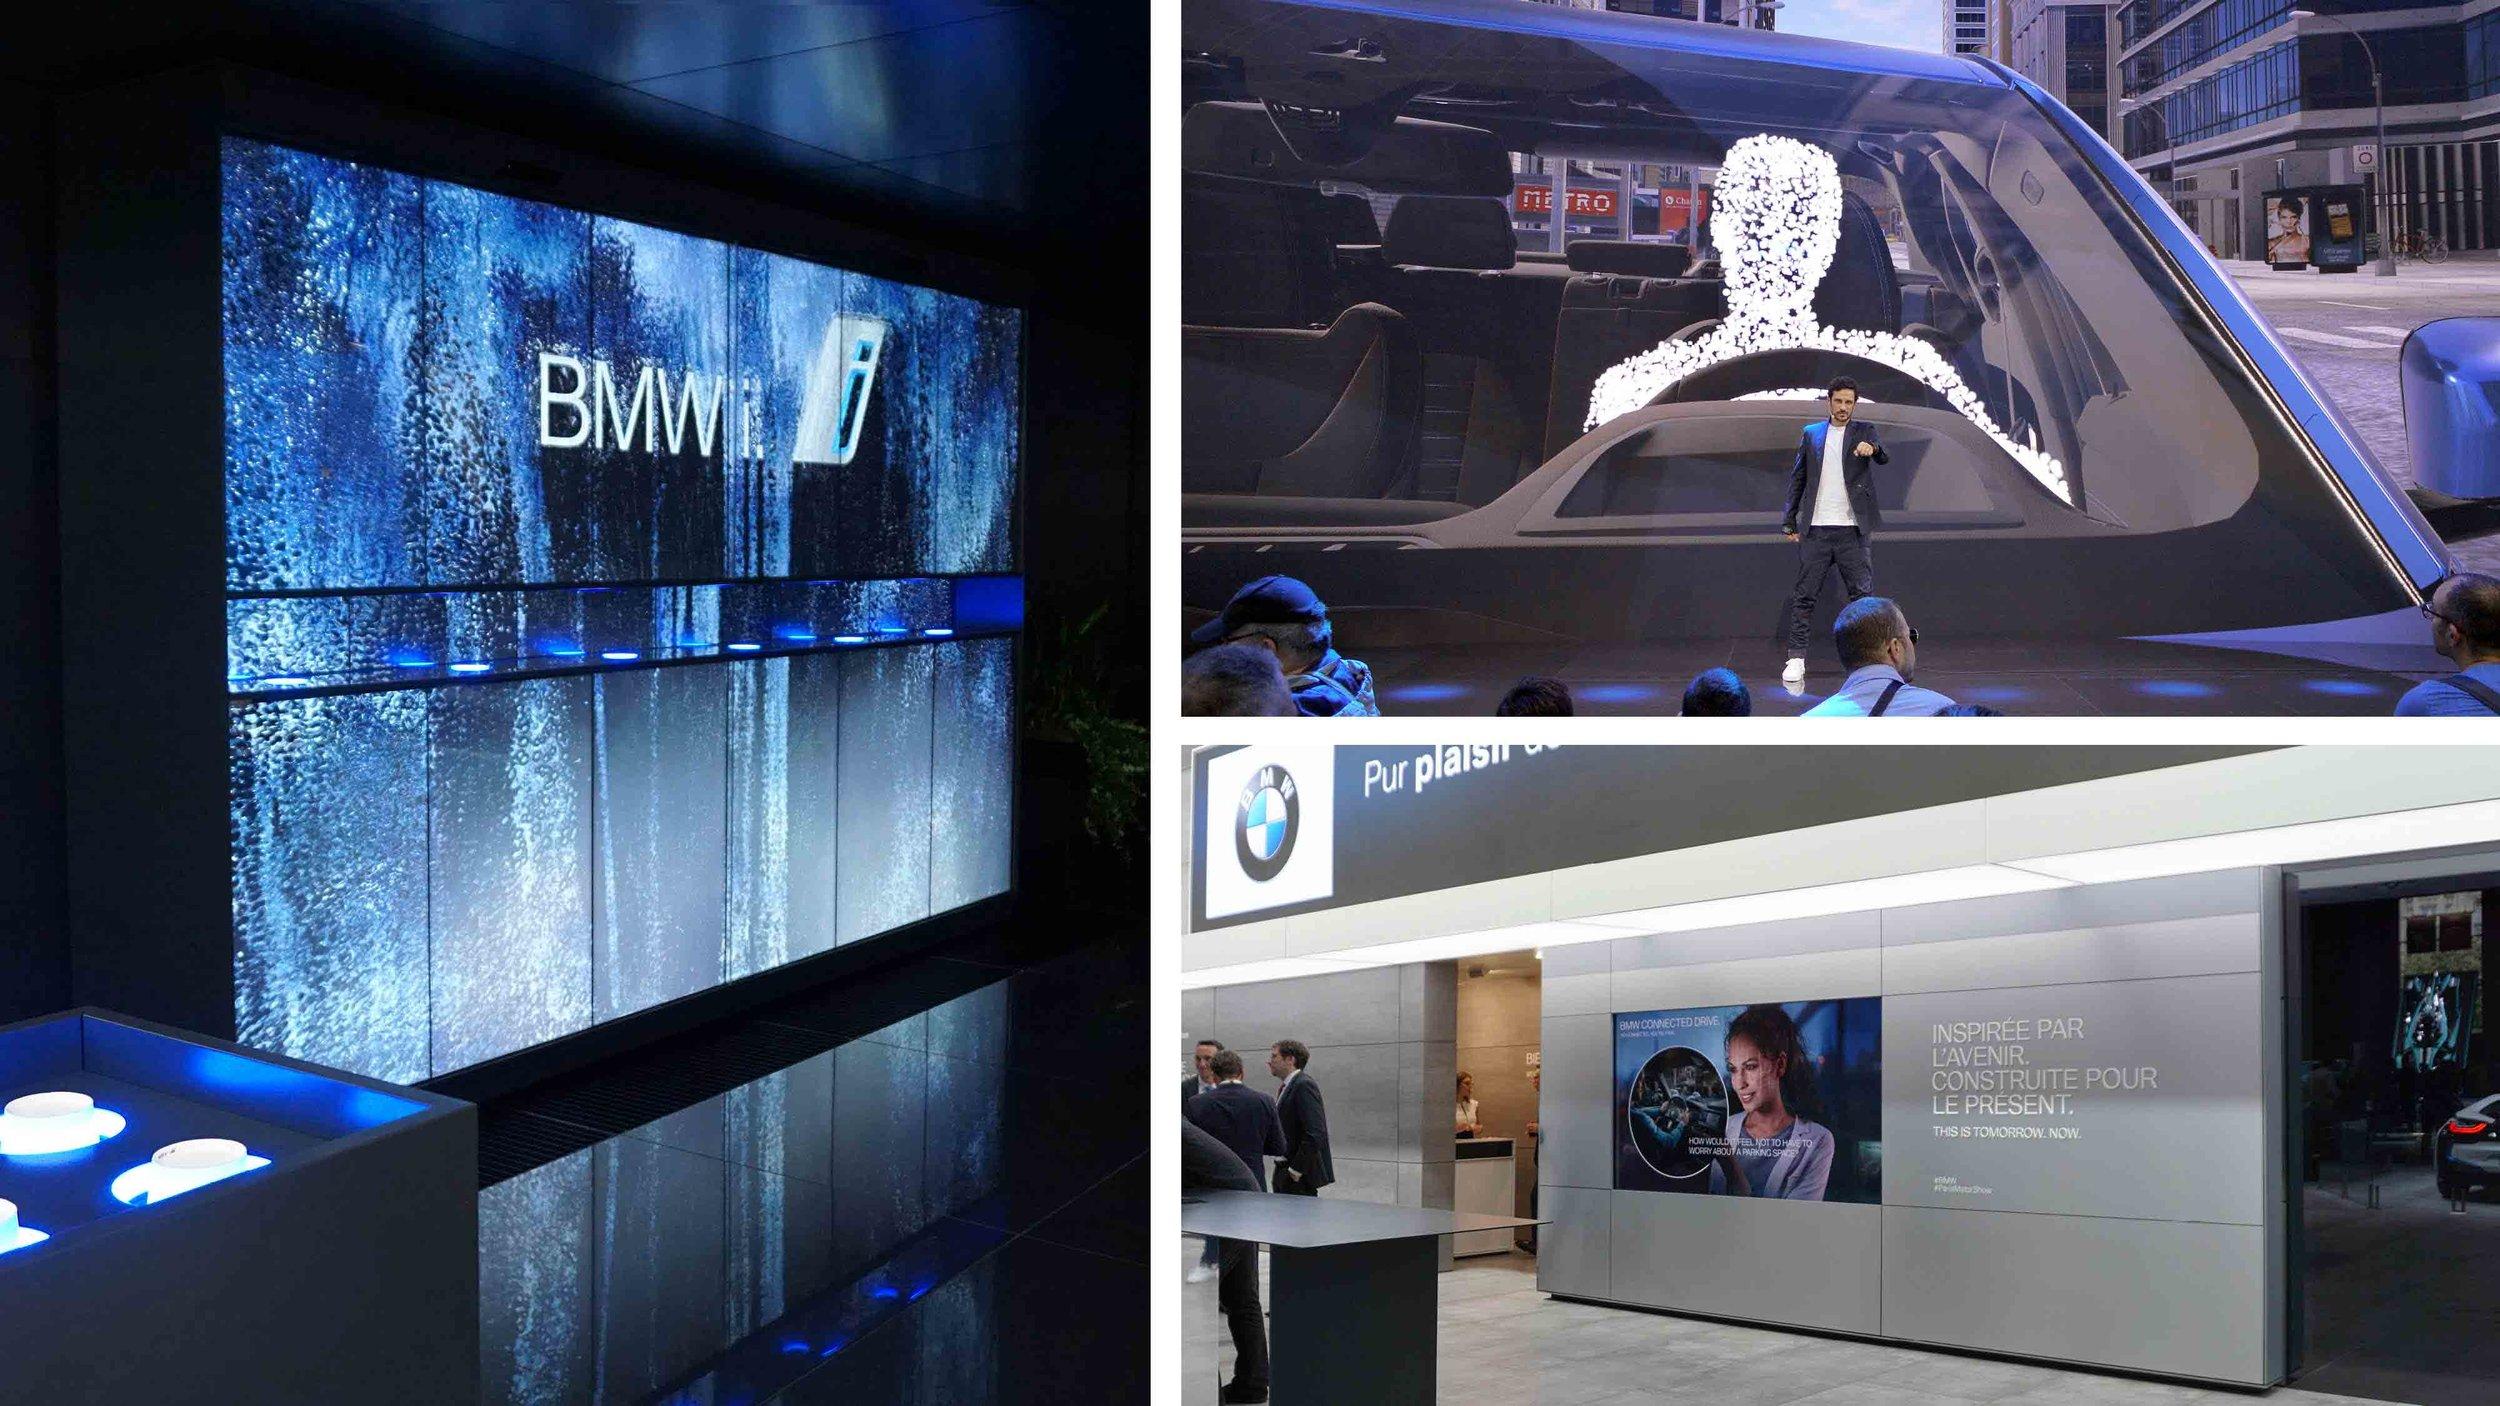 NEWS_BMW-Exhibits-Paris-2018_2_.jpg